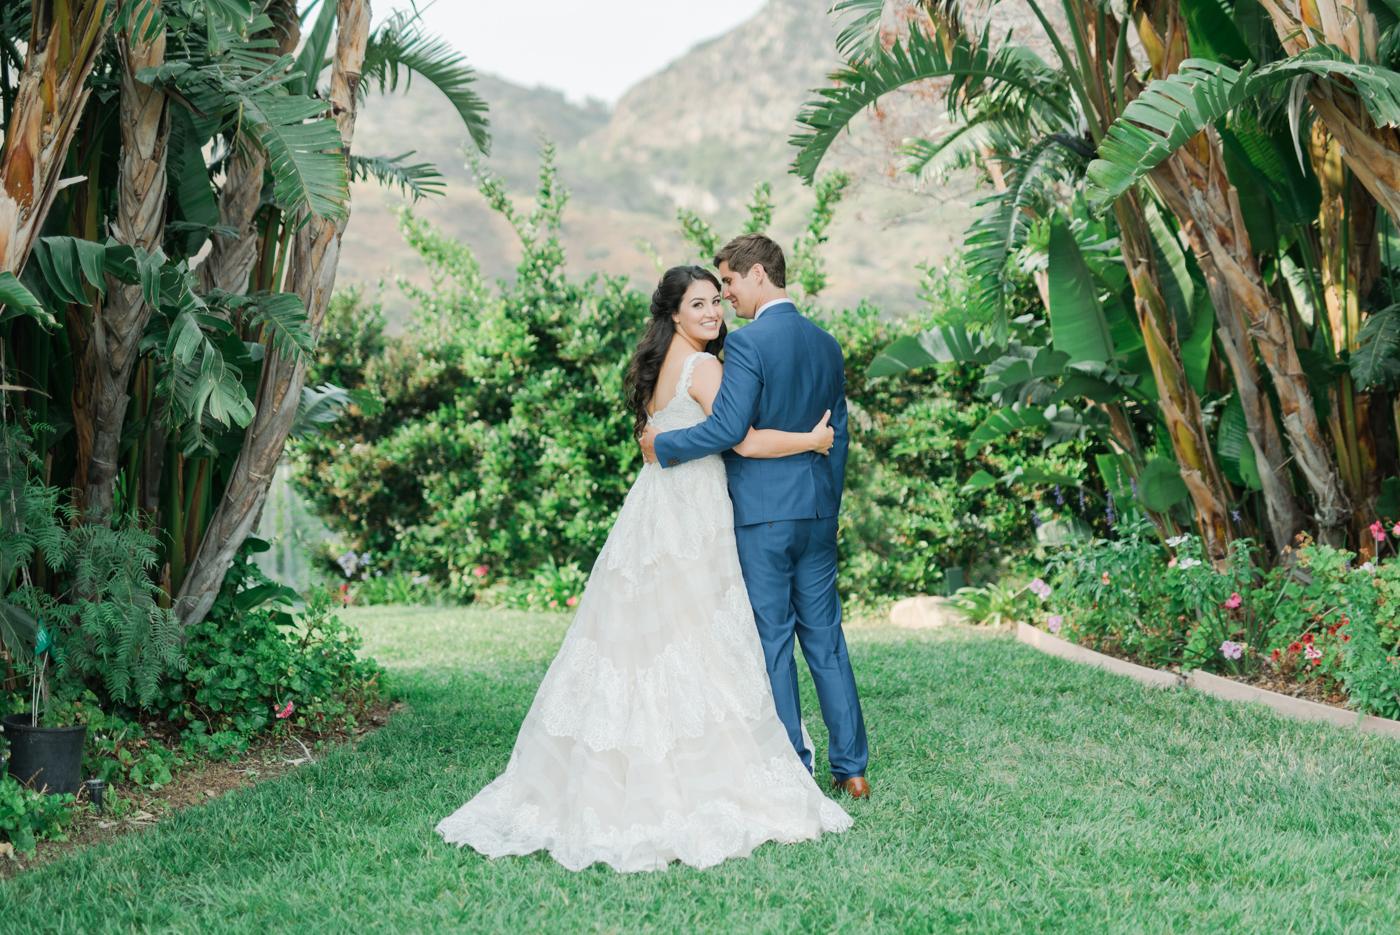 AKP_S&F_Malibu_Wedding_Fine_Art_Photography_Los_Angeles-37.jpg